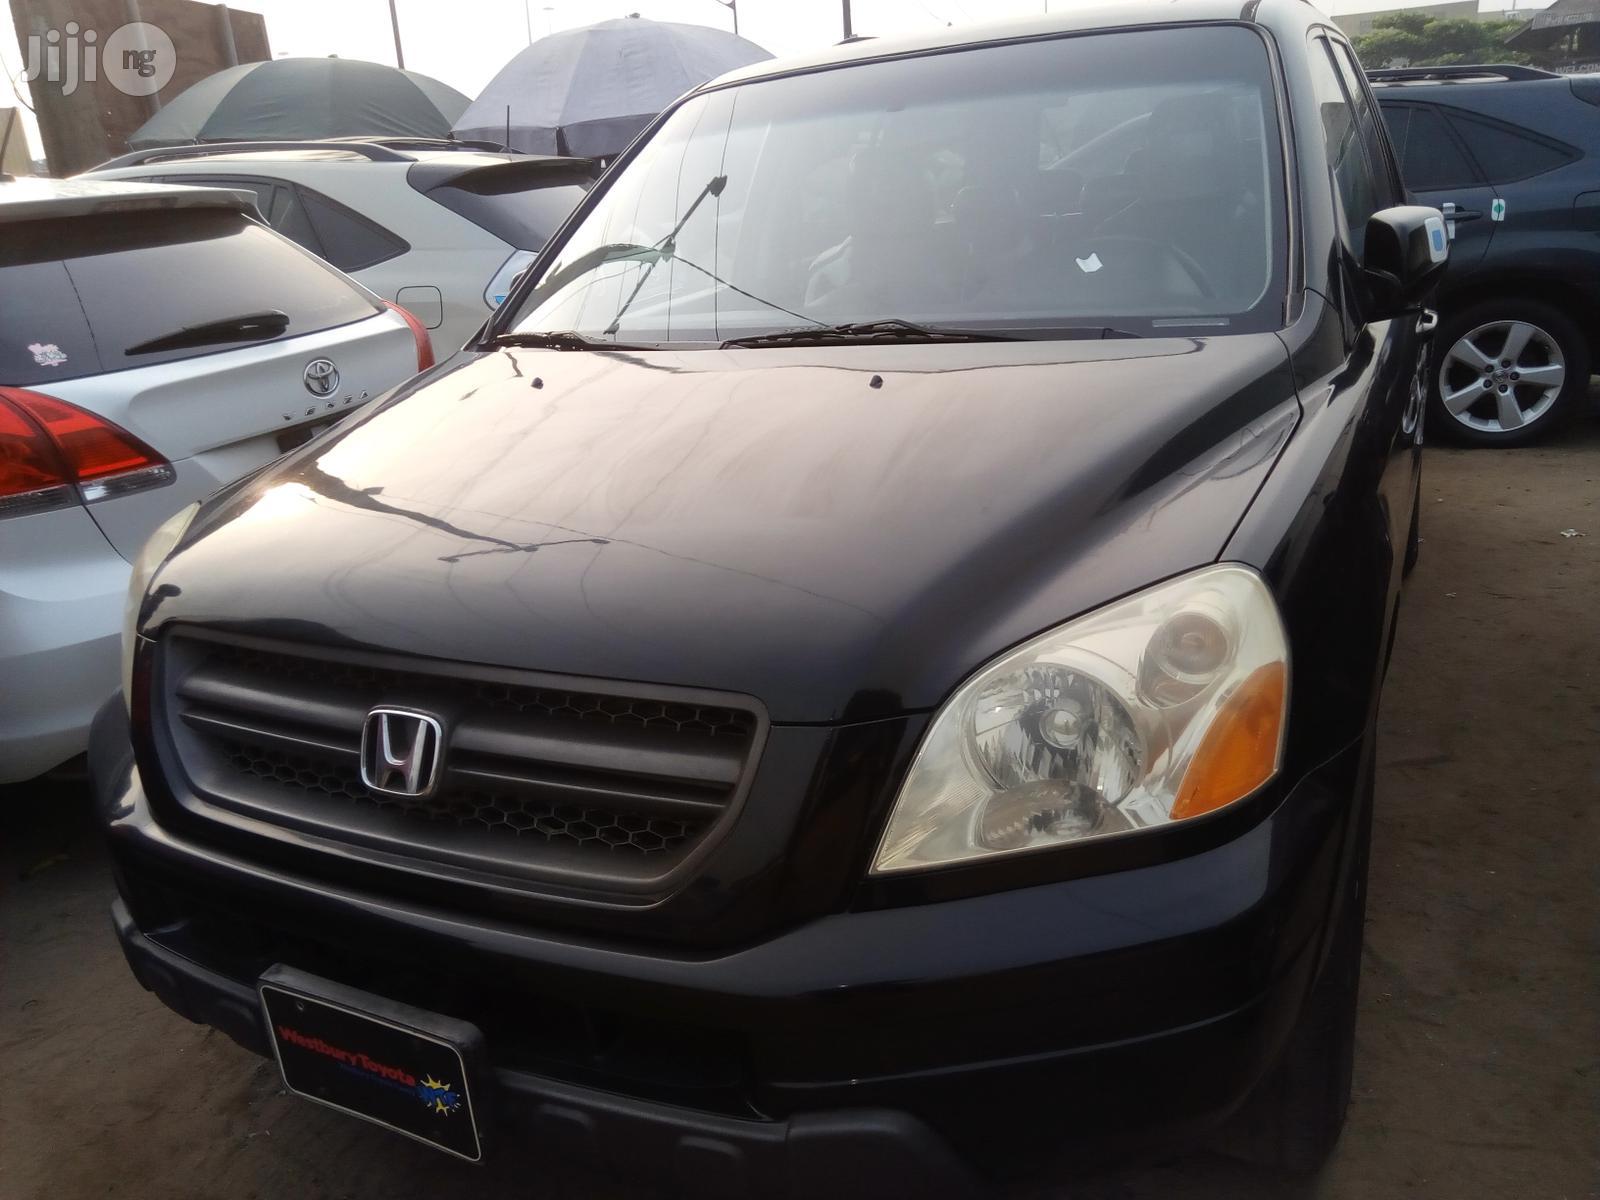 Honda Pilot 2005 LX 4x4 (3.5L 6cyl 5A) Black